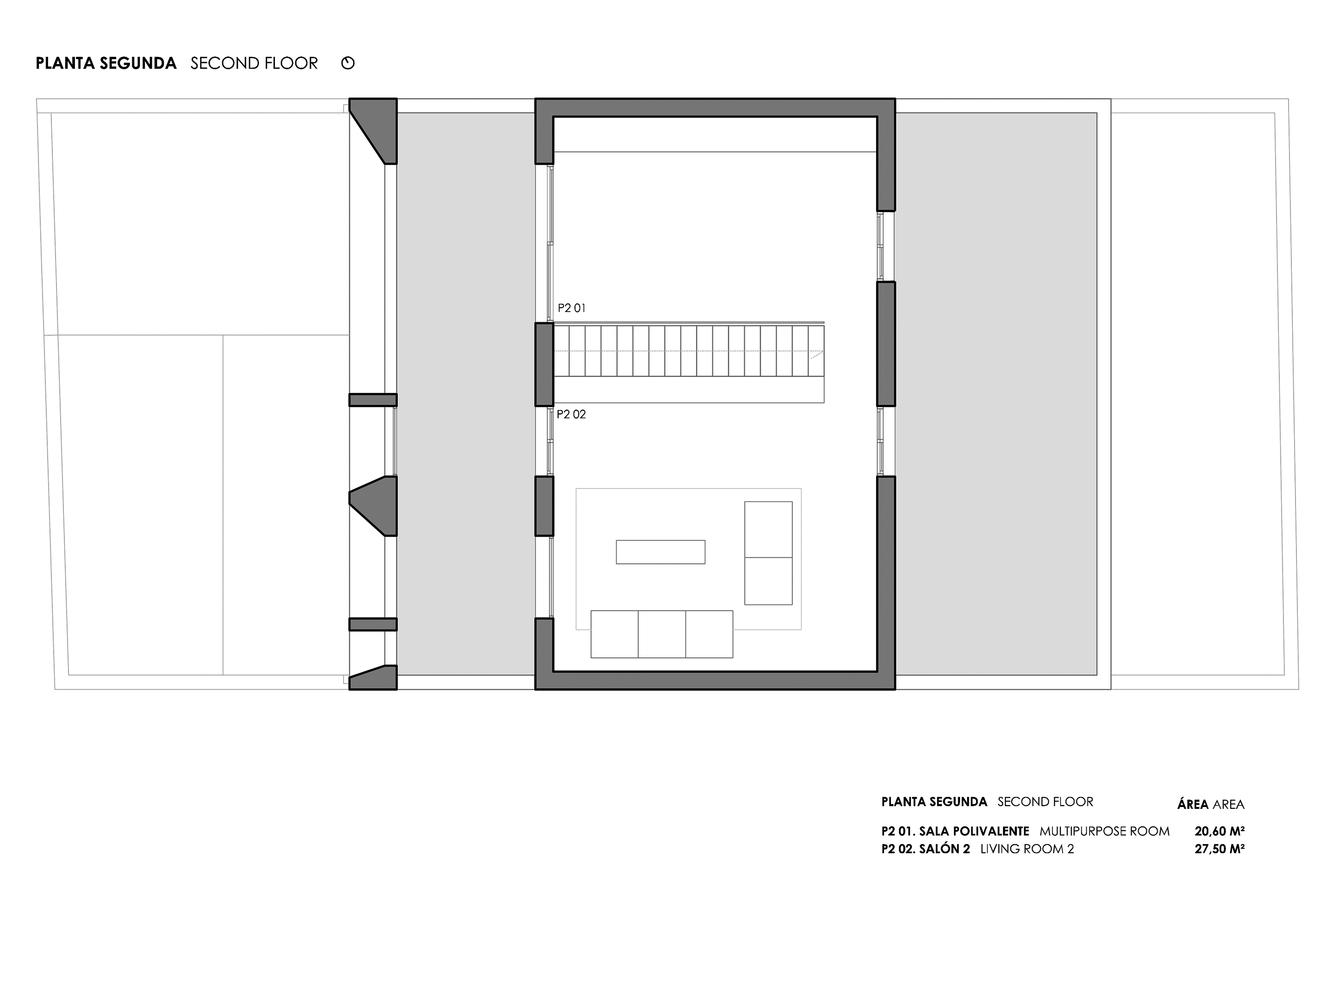 Mặt bằng biệt thự 300m2 - Brise Soleil House 4